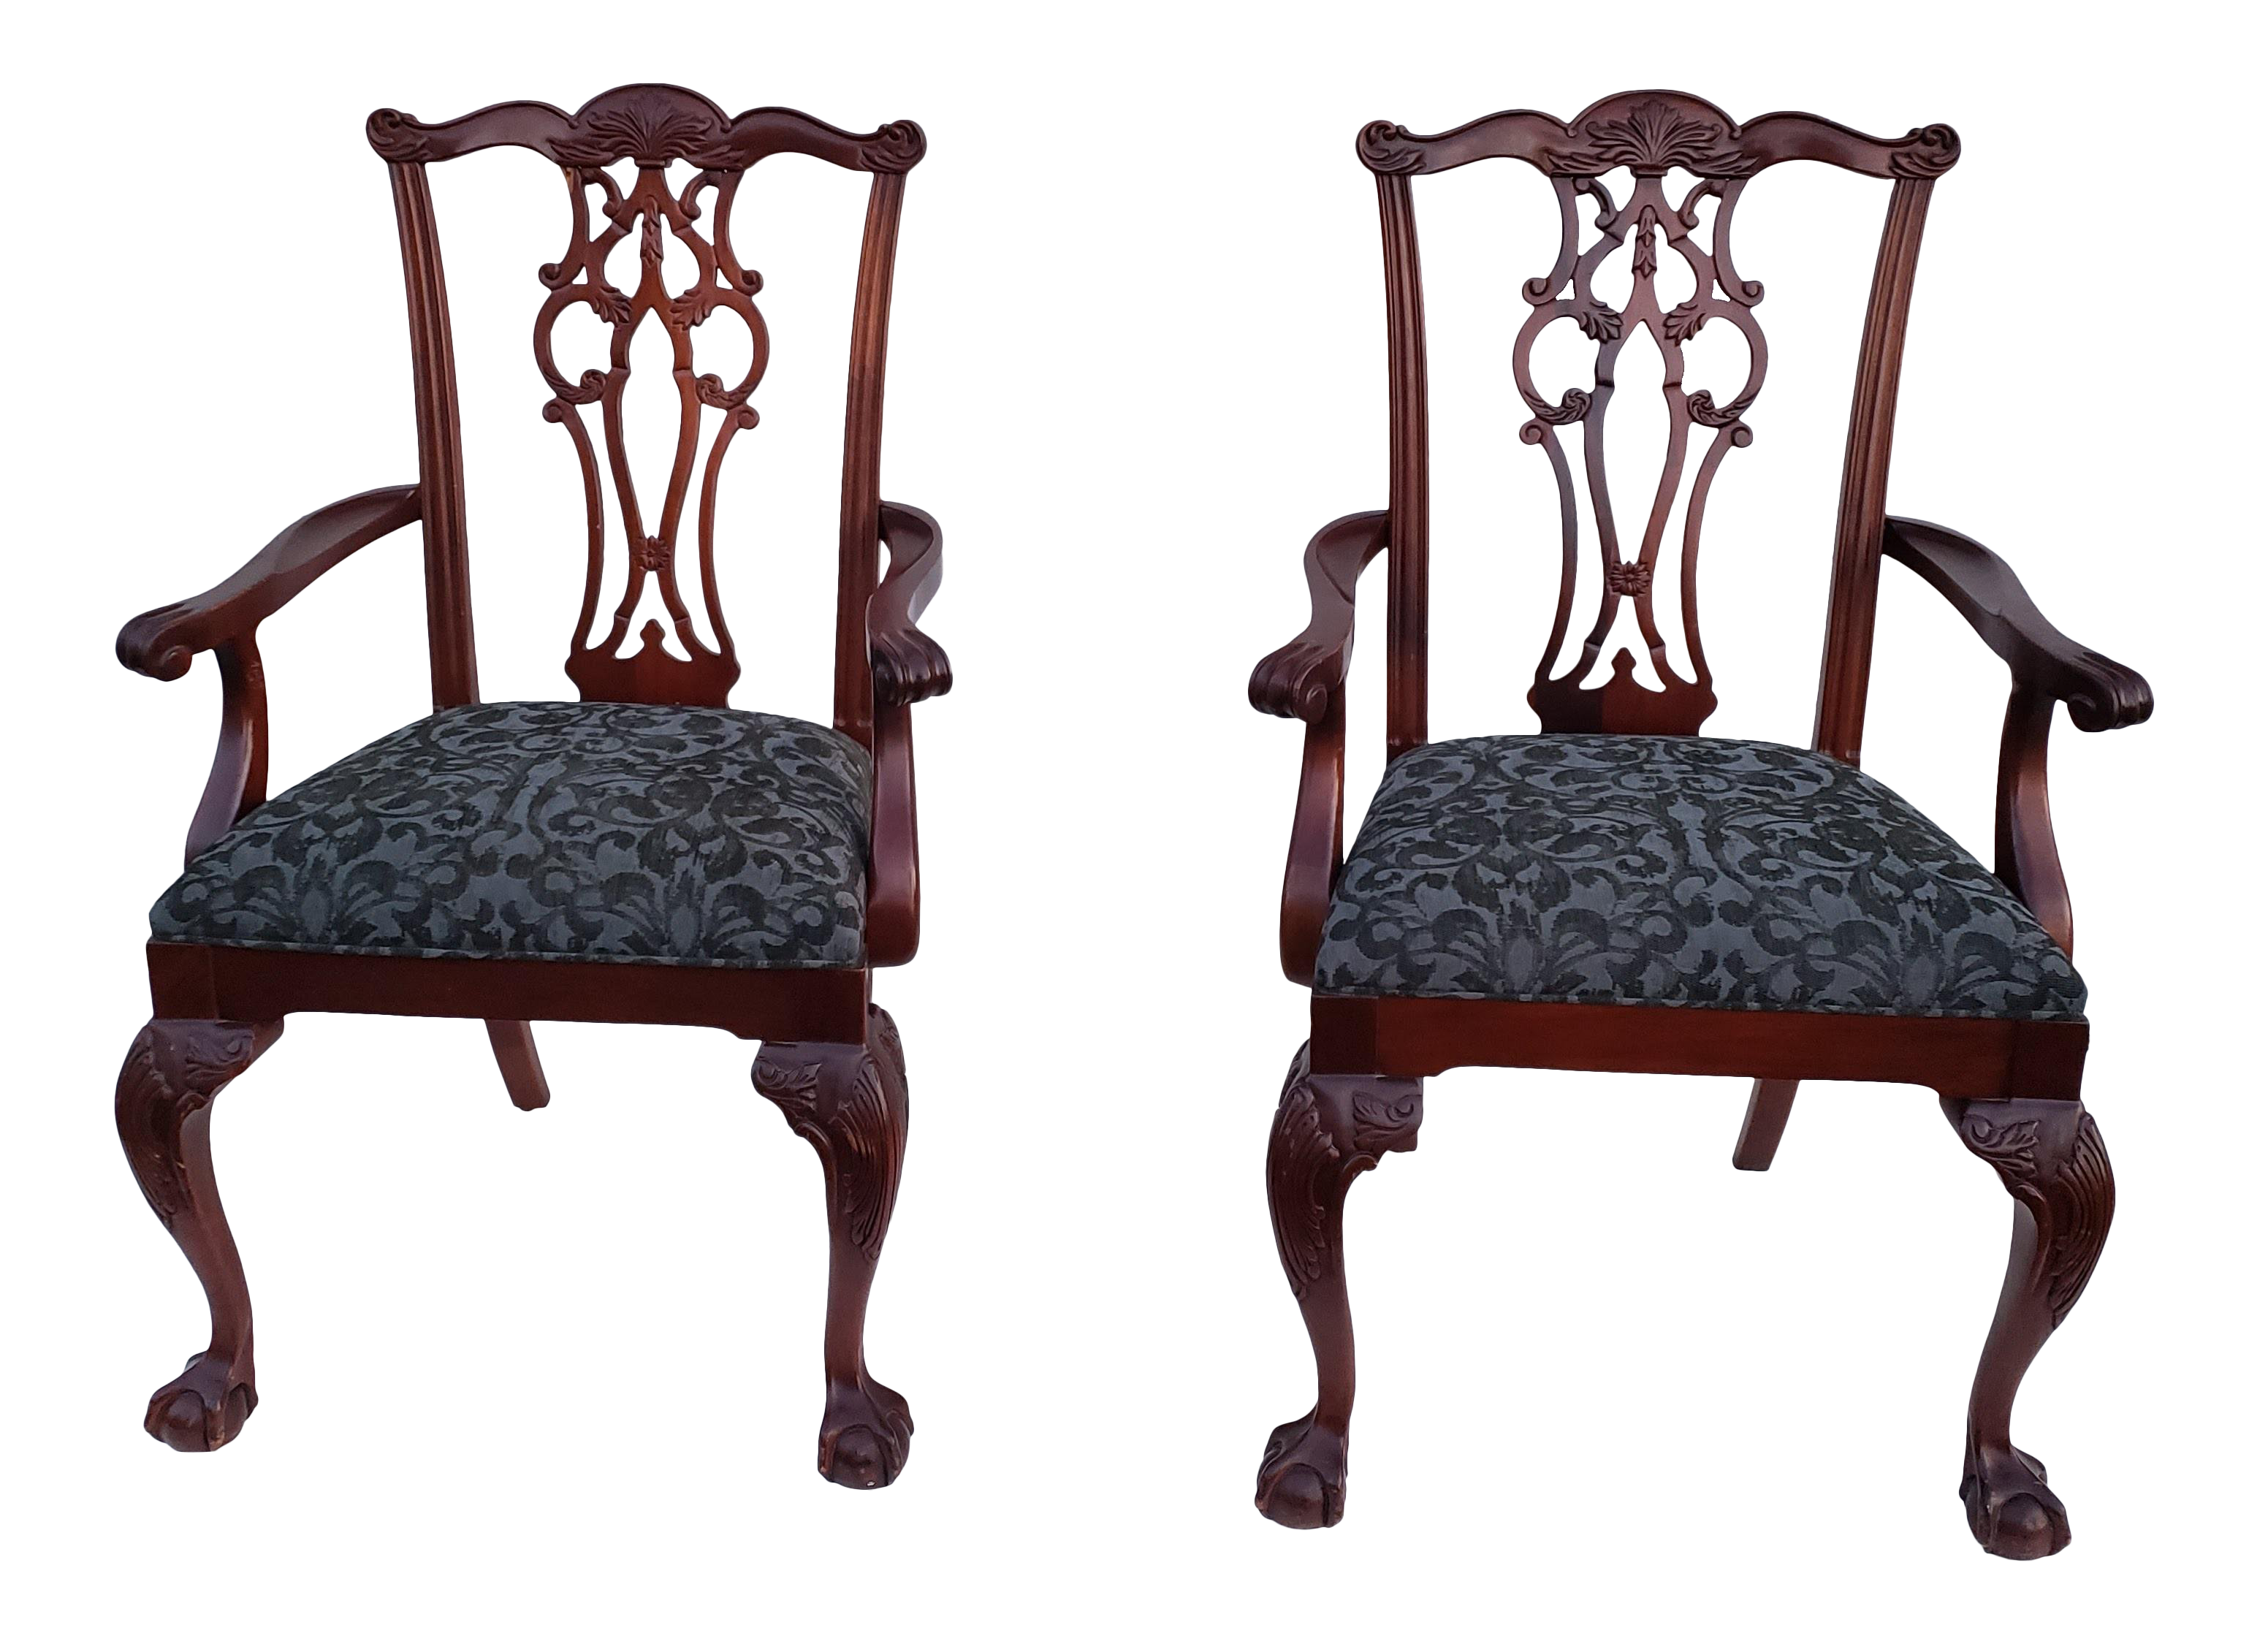 Modern ethan allen 18th century mahogany armchairs a pair chairish